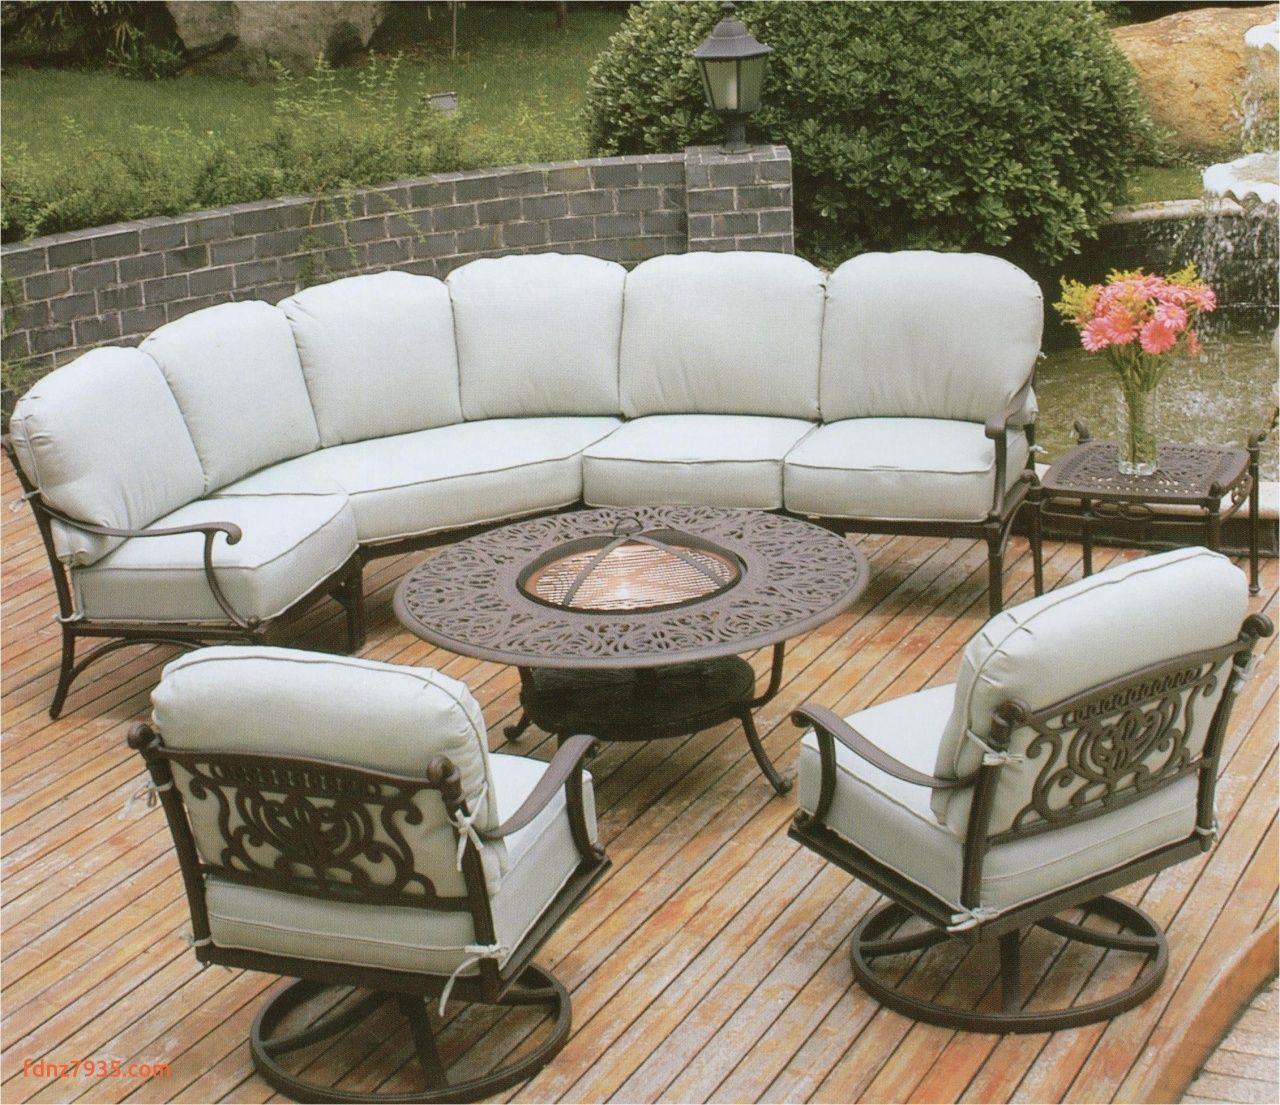 Martha Stewart Outdoor Patio Furniture In 2020 Outdoor Cushions